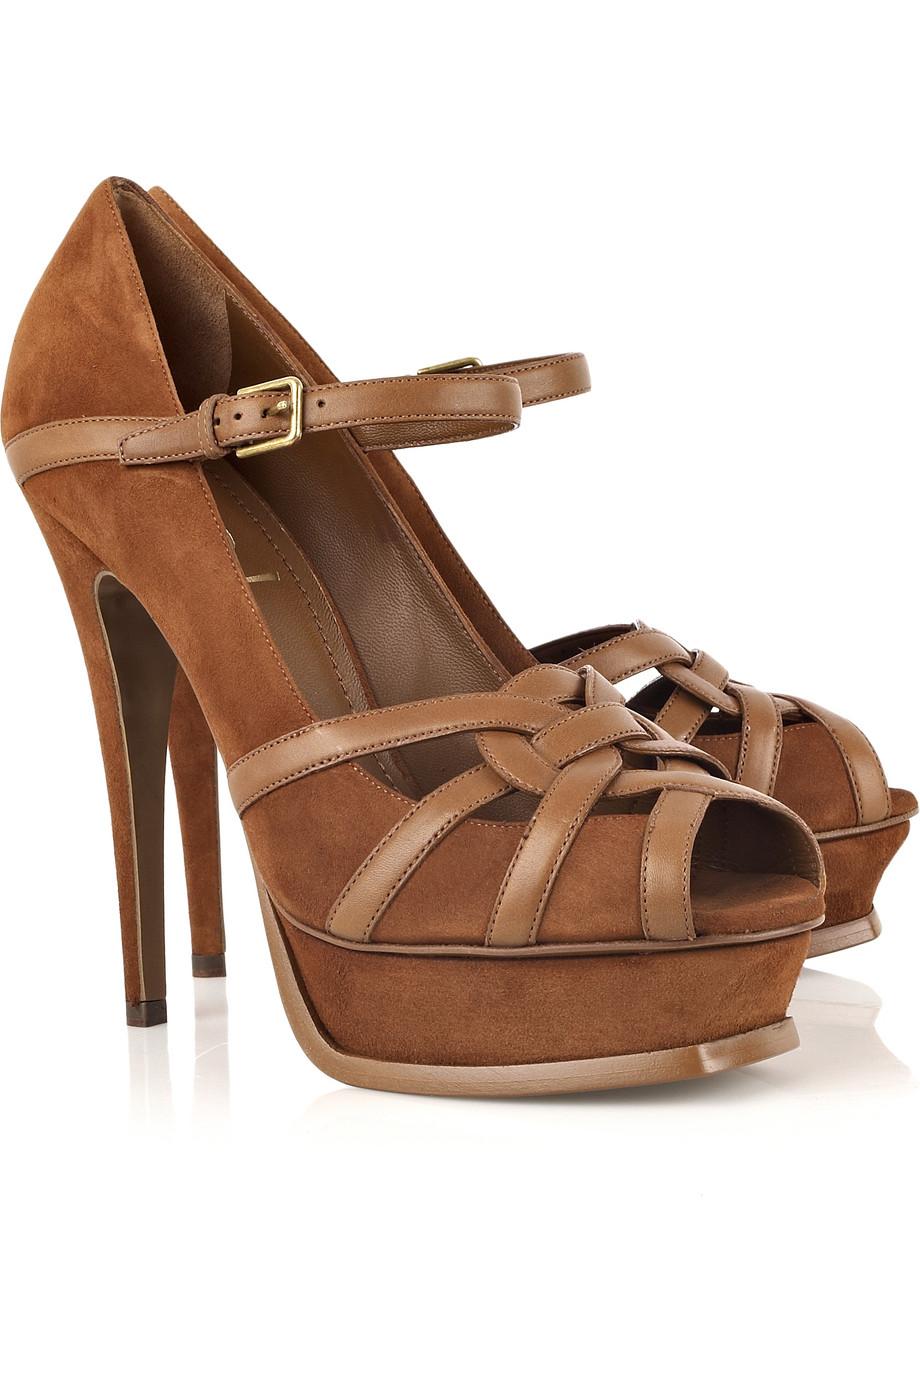 Saint Laurent Tribute Suede Sandals In Brown Lyst